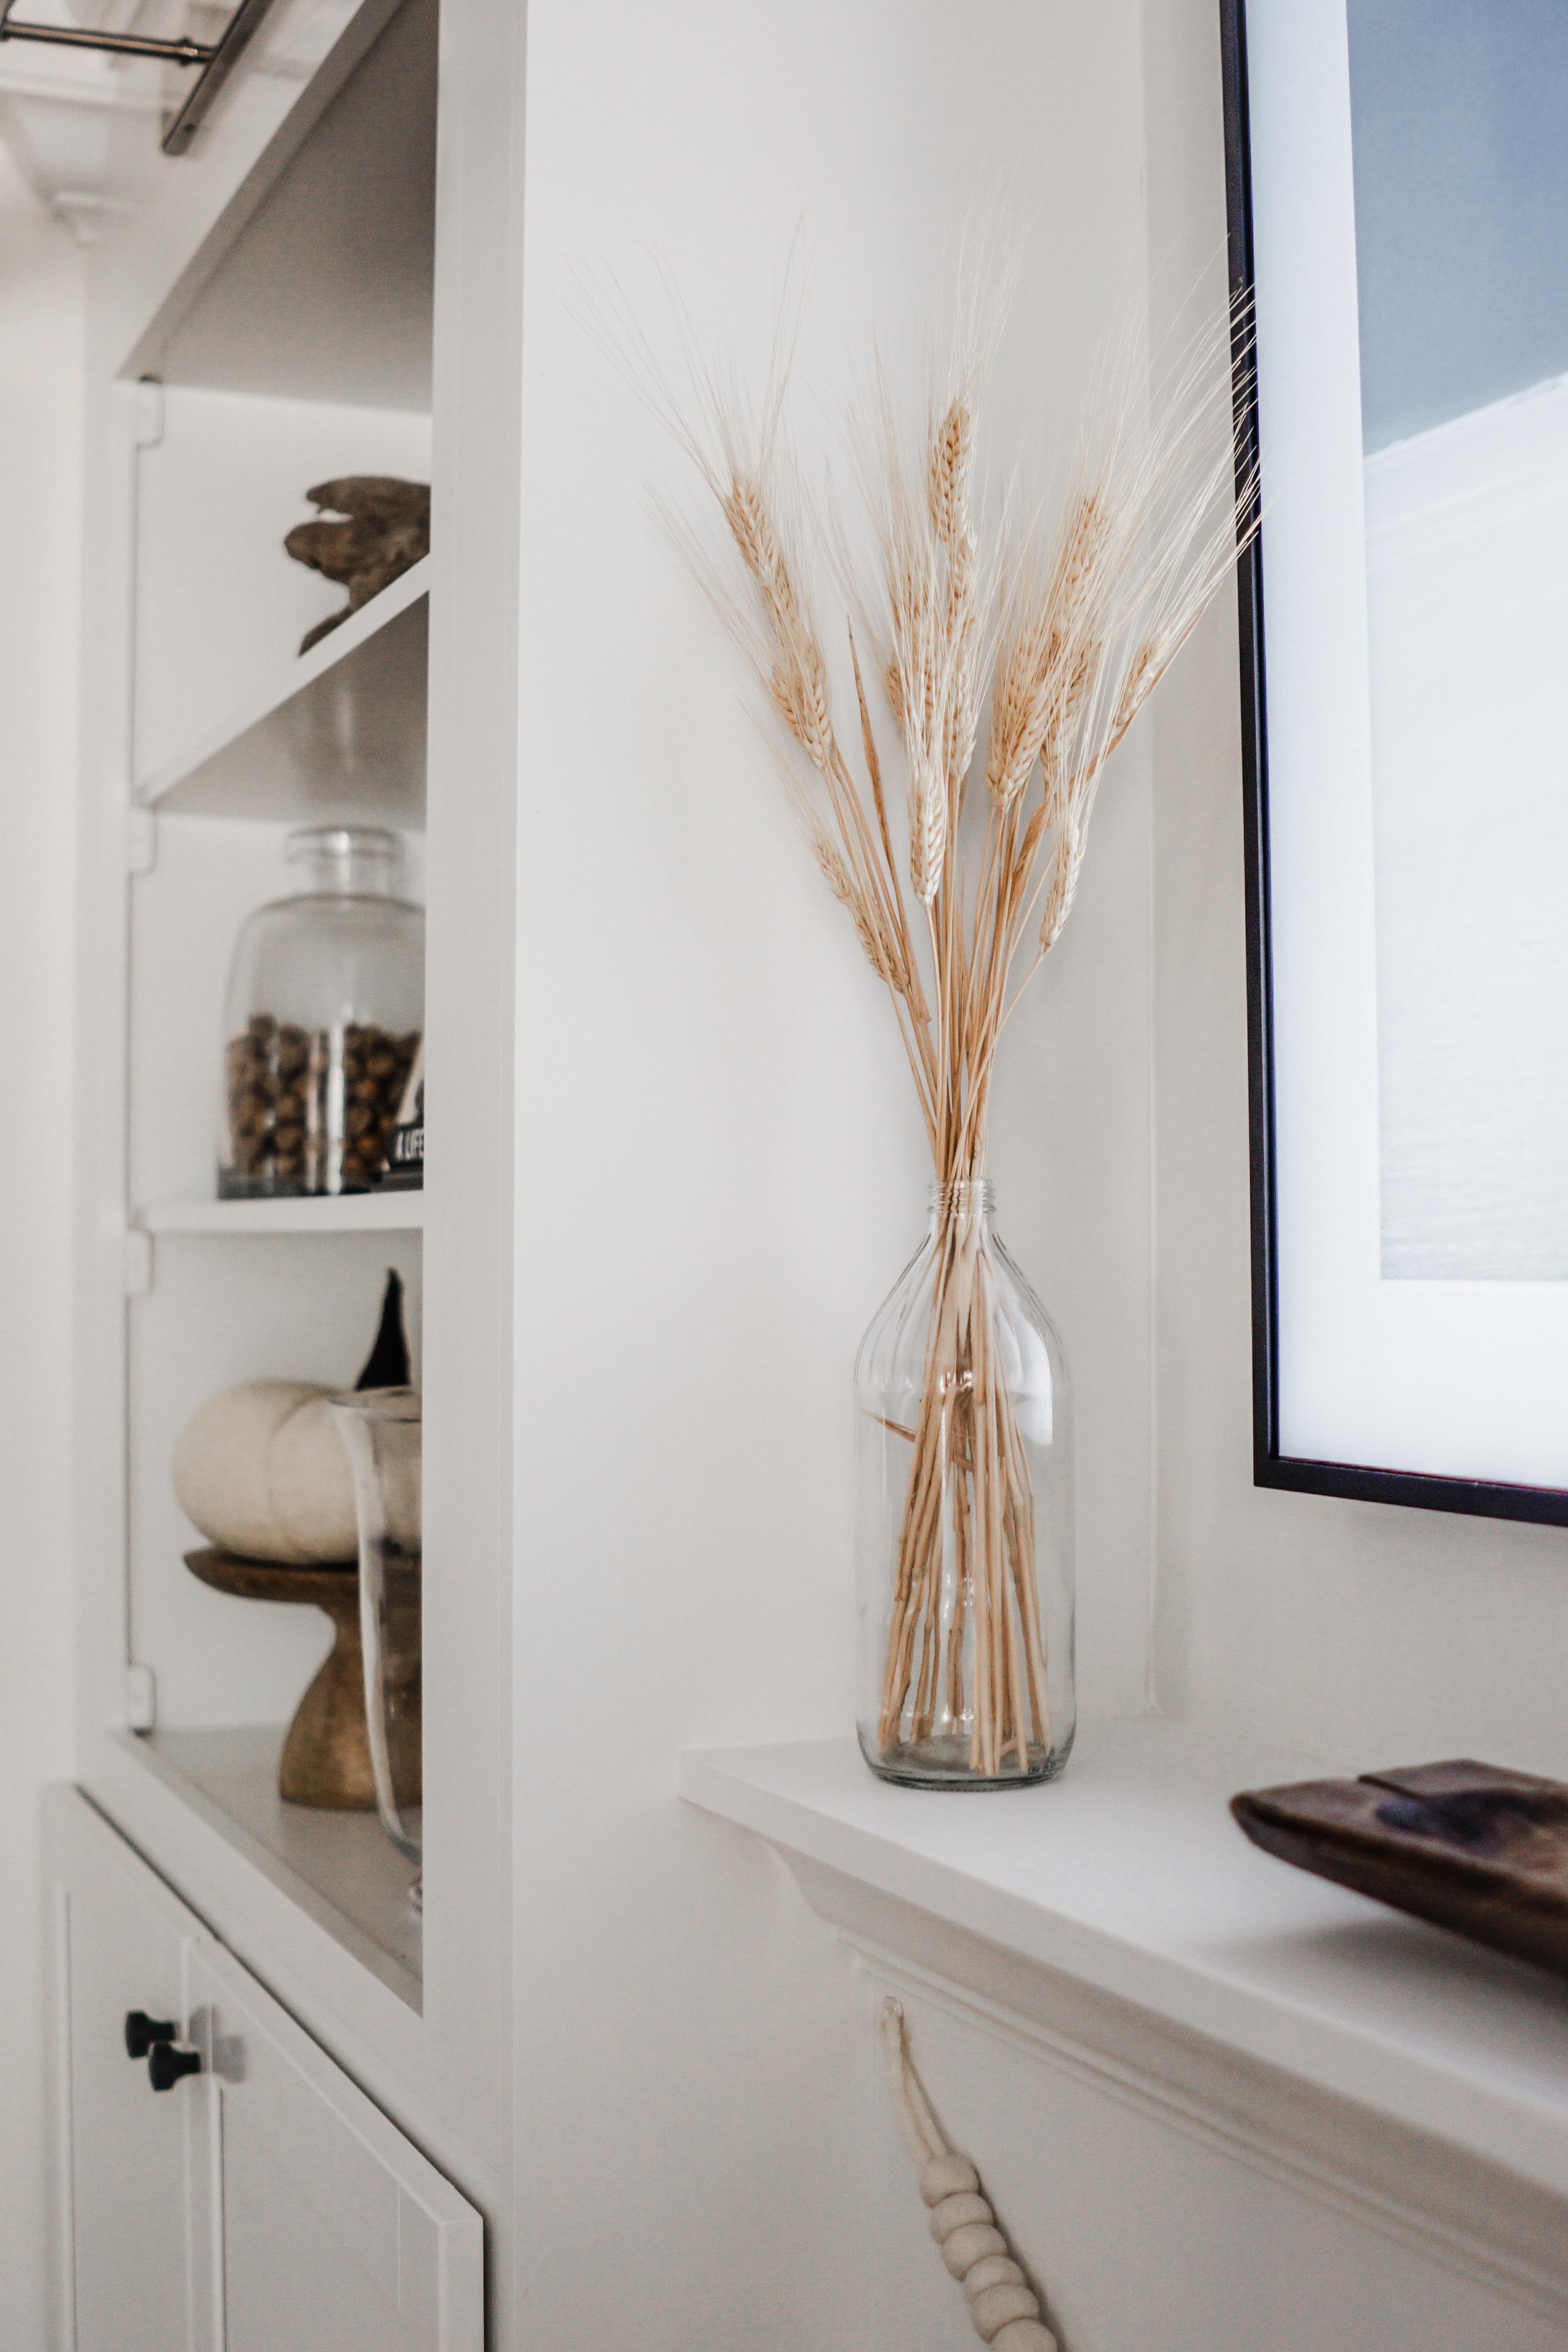 fall decor inspiration - Wheat in a glass vase // fall living room decor idea